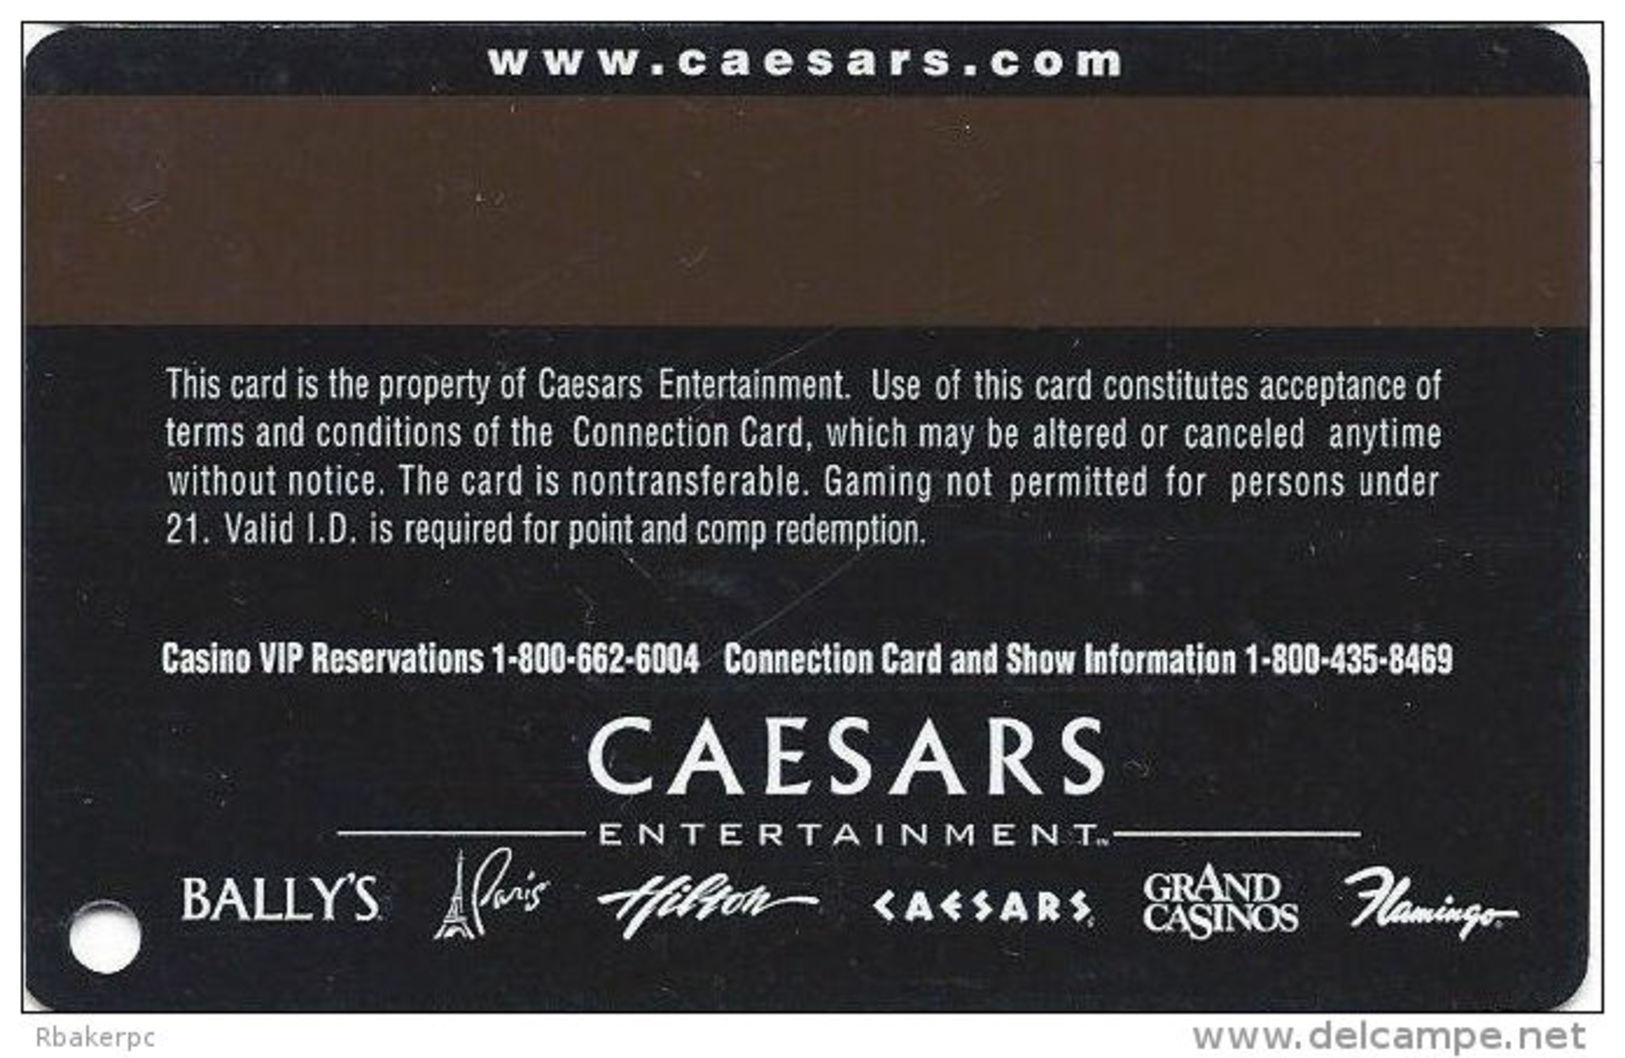 Flamingo Hilton Casino Laughlin, NV - Slot Card - Caesars Web Address - GOOD LUCK PLAYER - Casino Cards